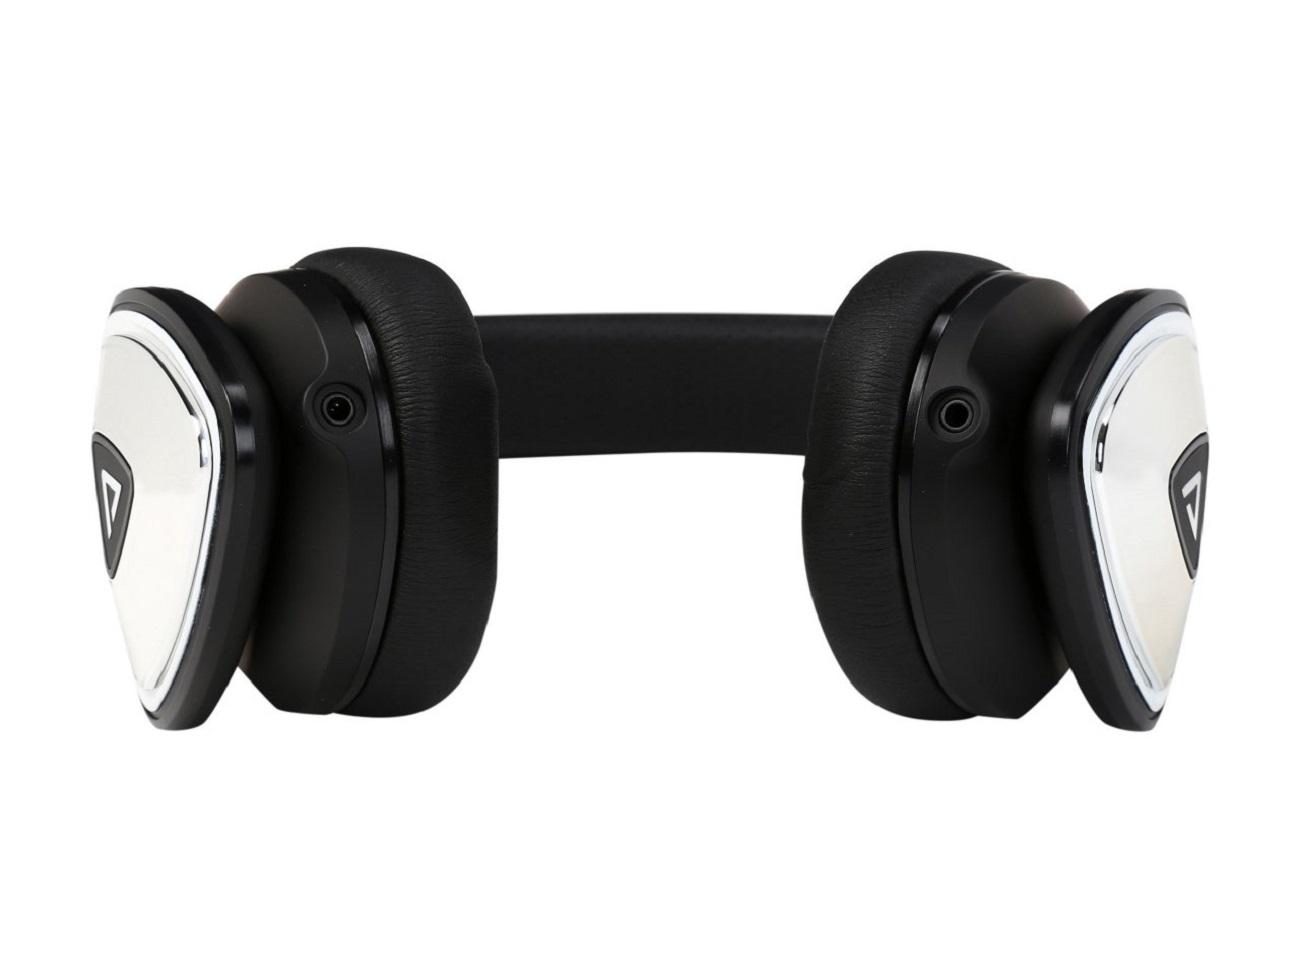 Monster DNA Pro Over-Ear Headphones